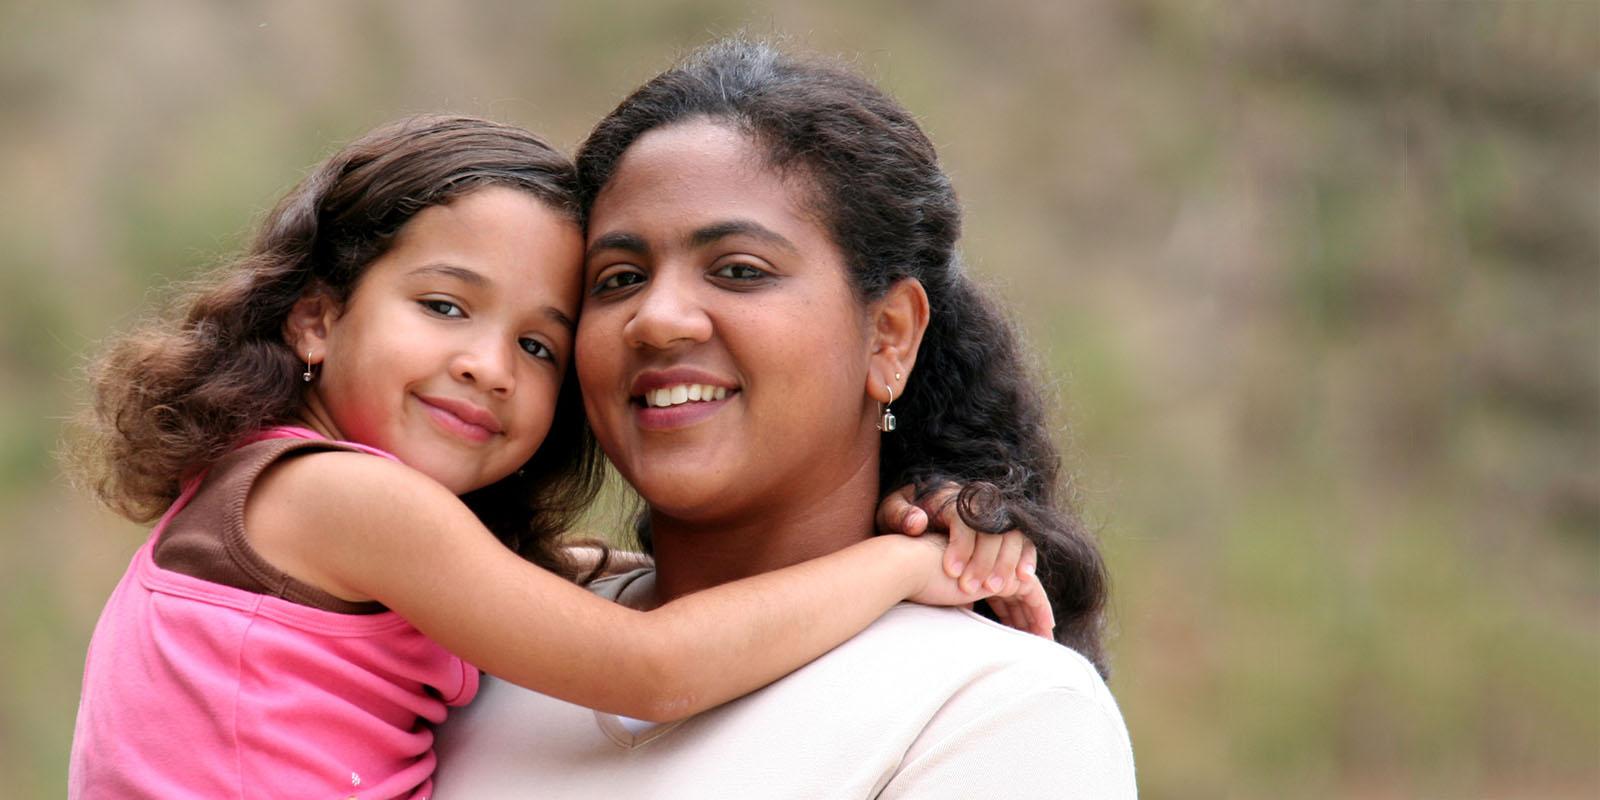 Women and Children Support